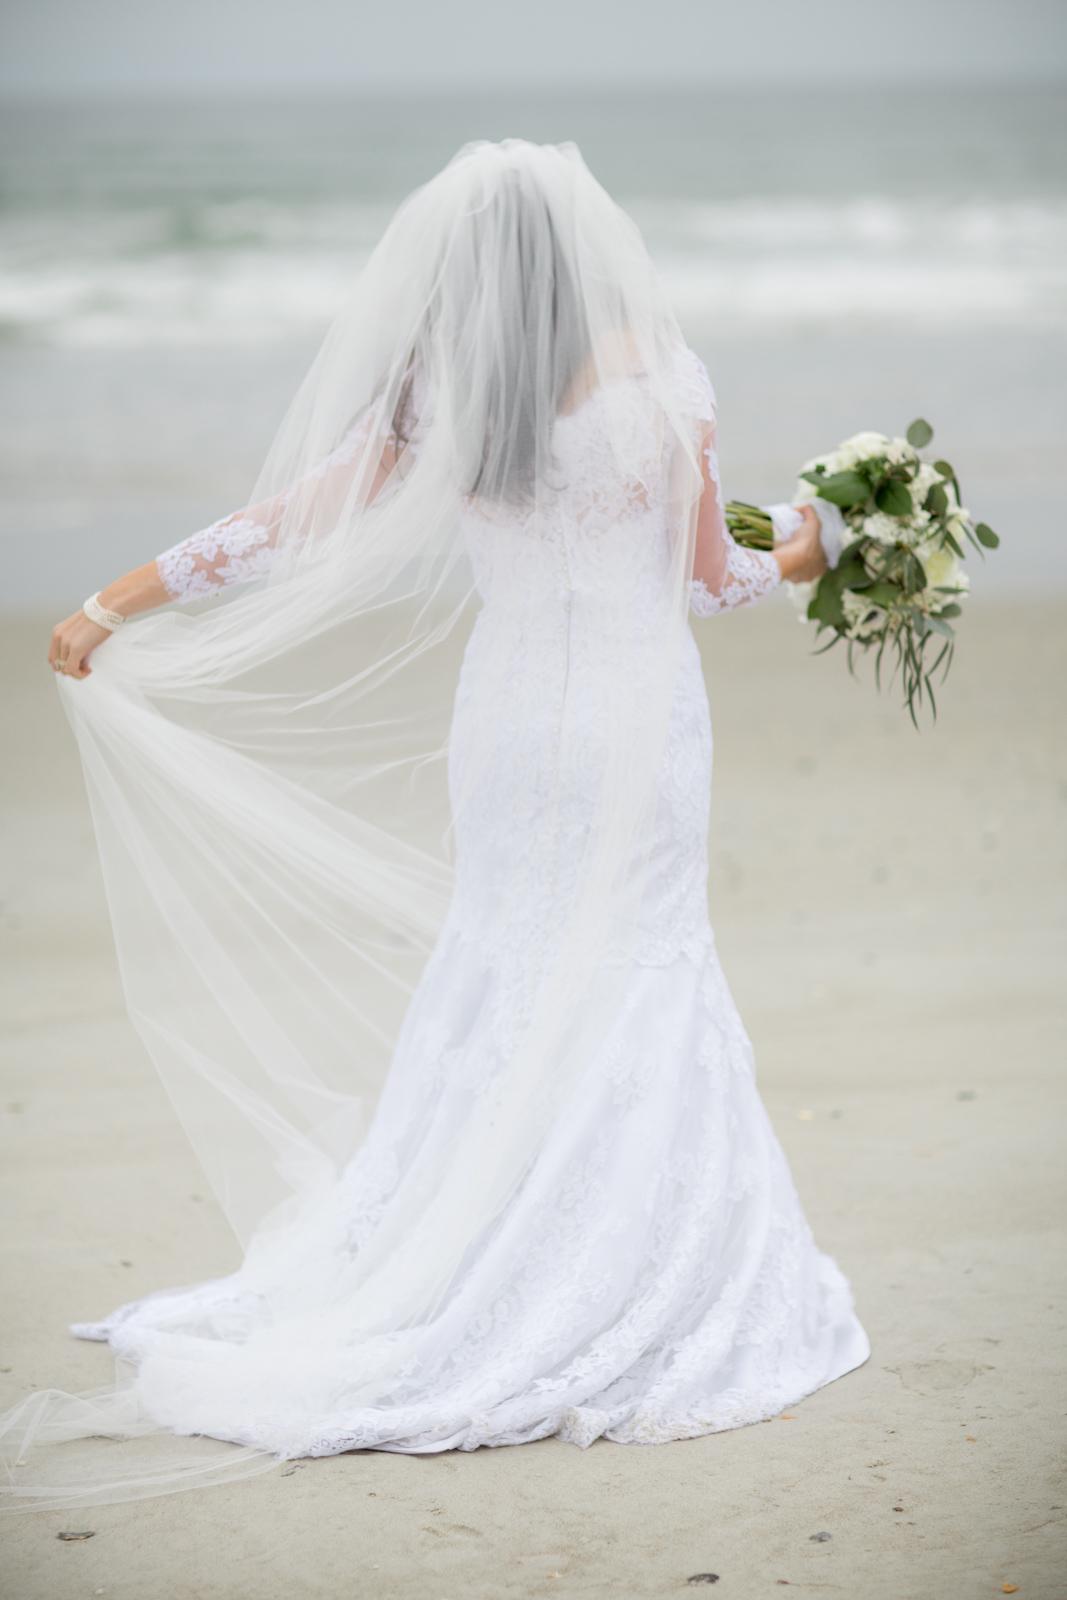 Figure eight island wedding-28.jpg